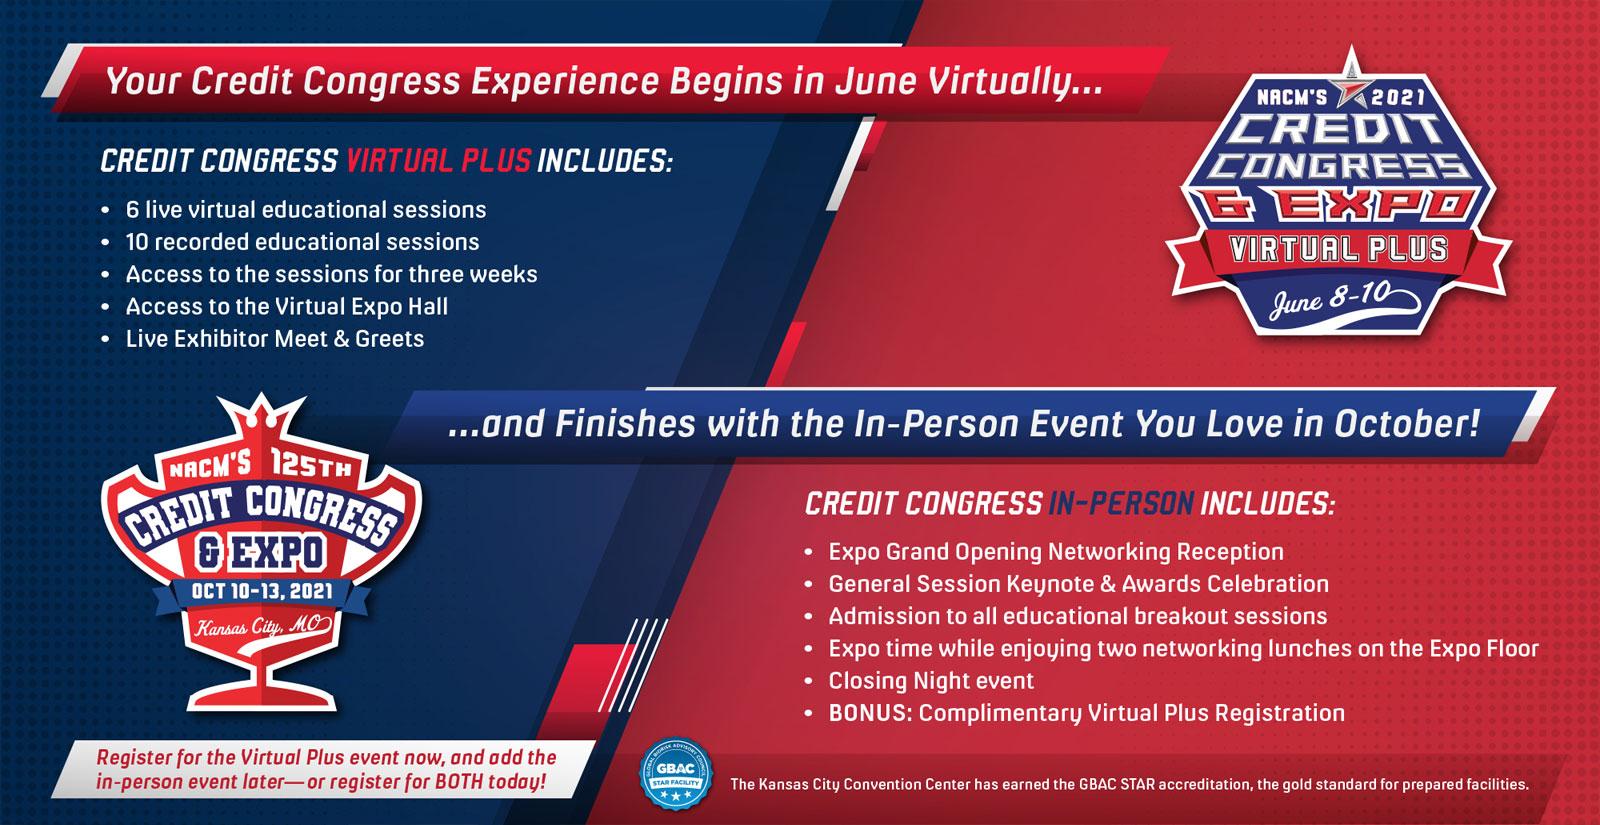 NACM Virtual Plus Credit Congress Approaching, Register Now!